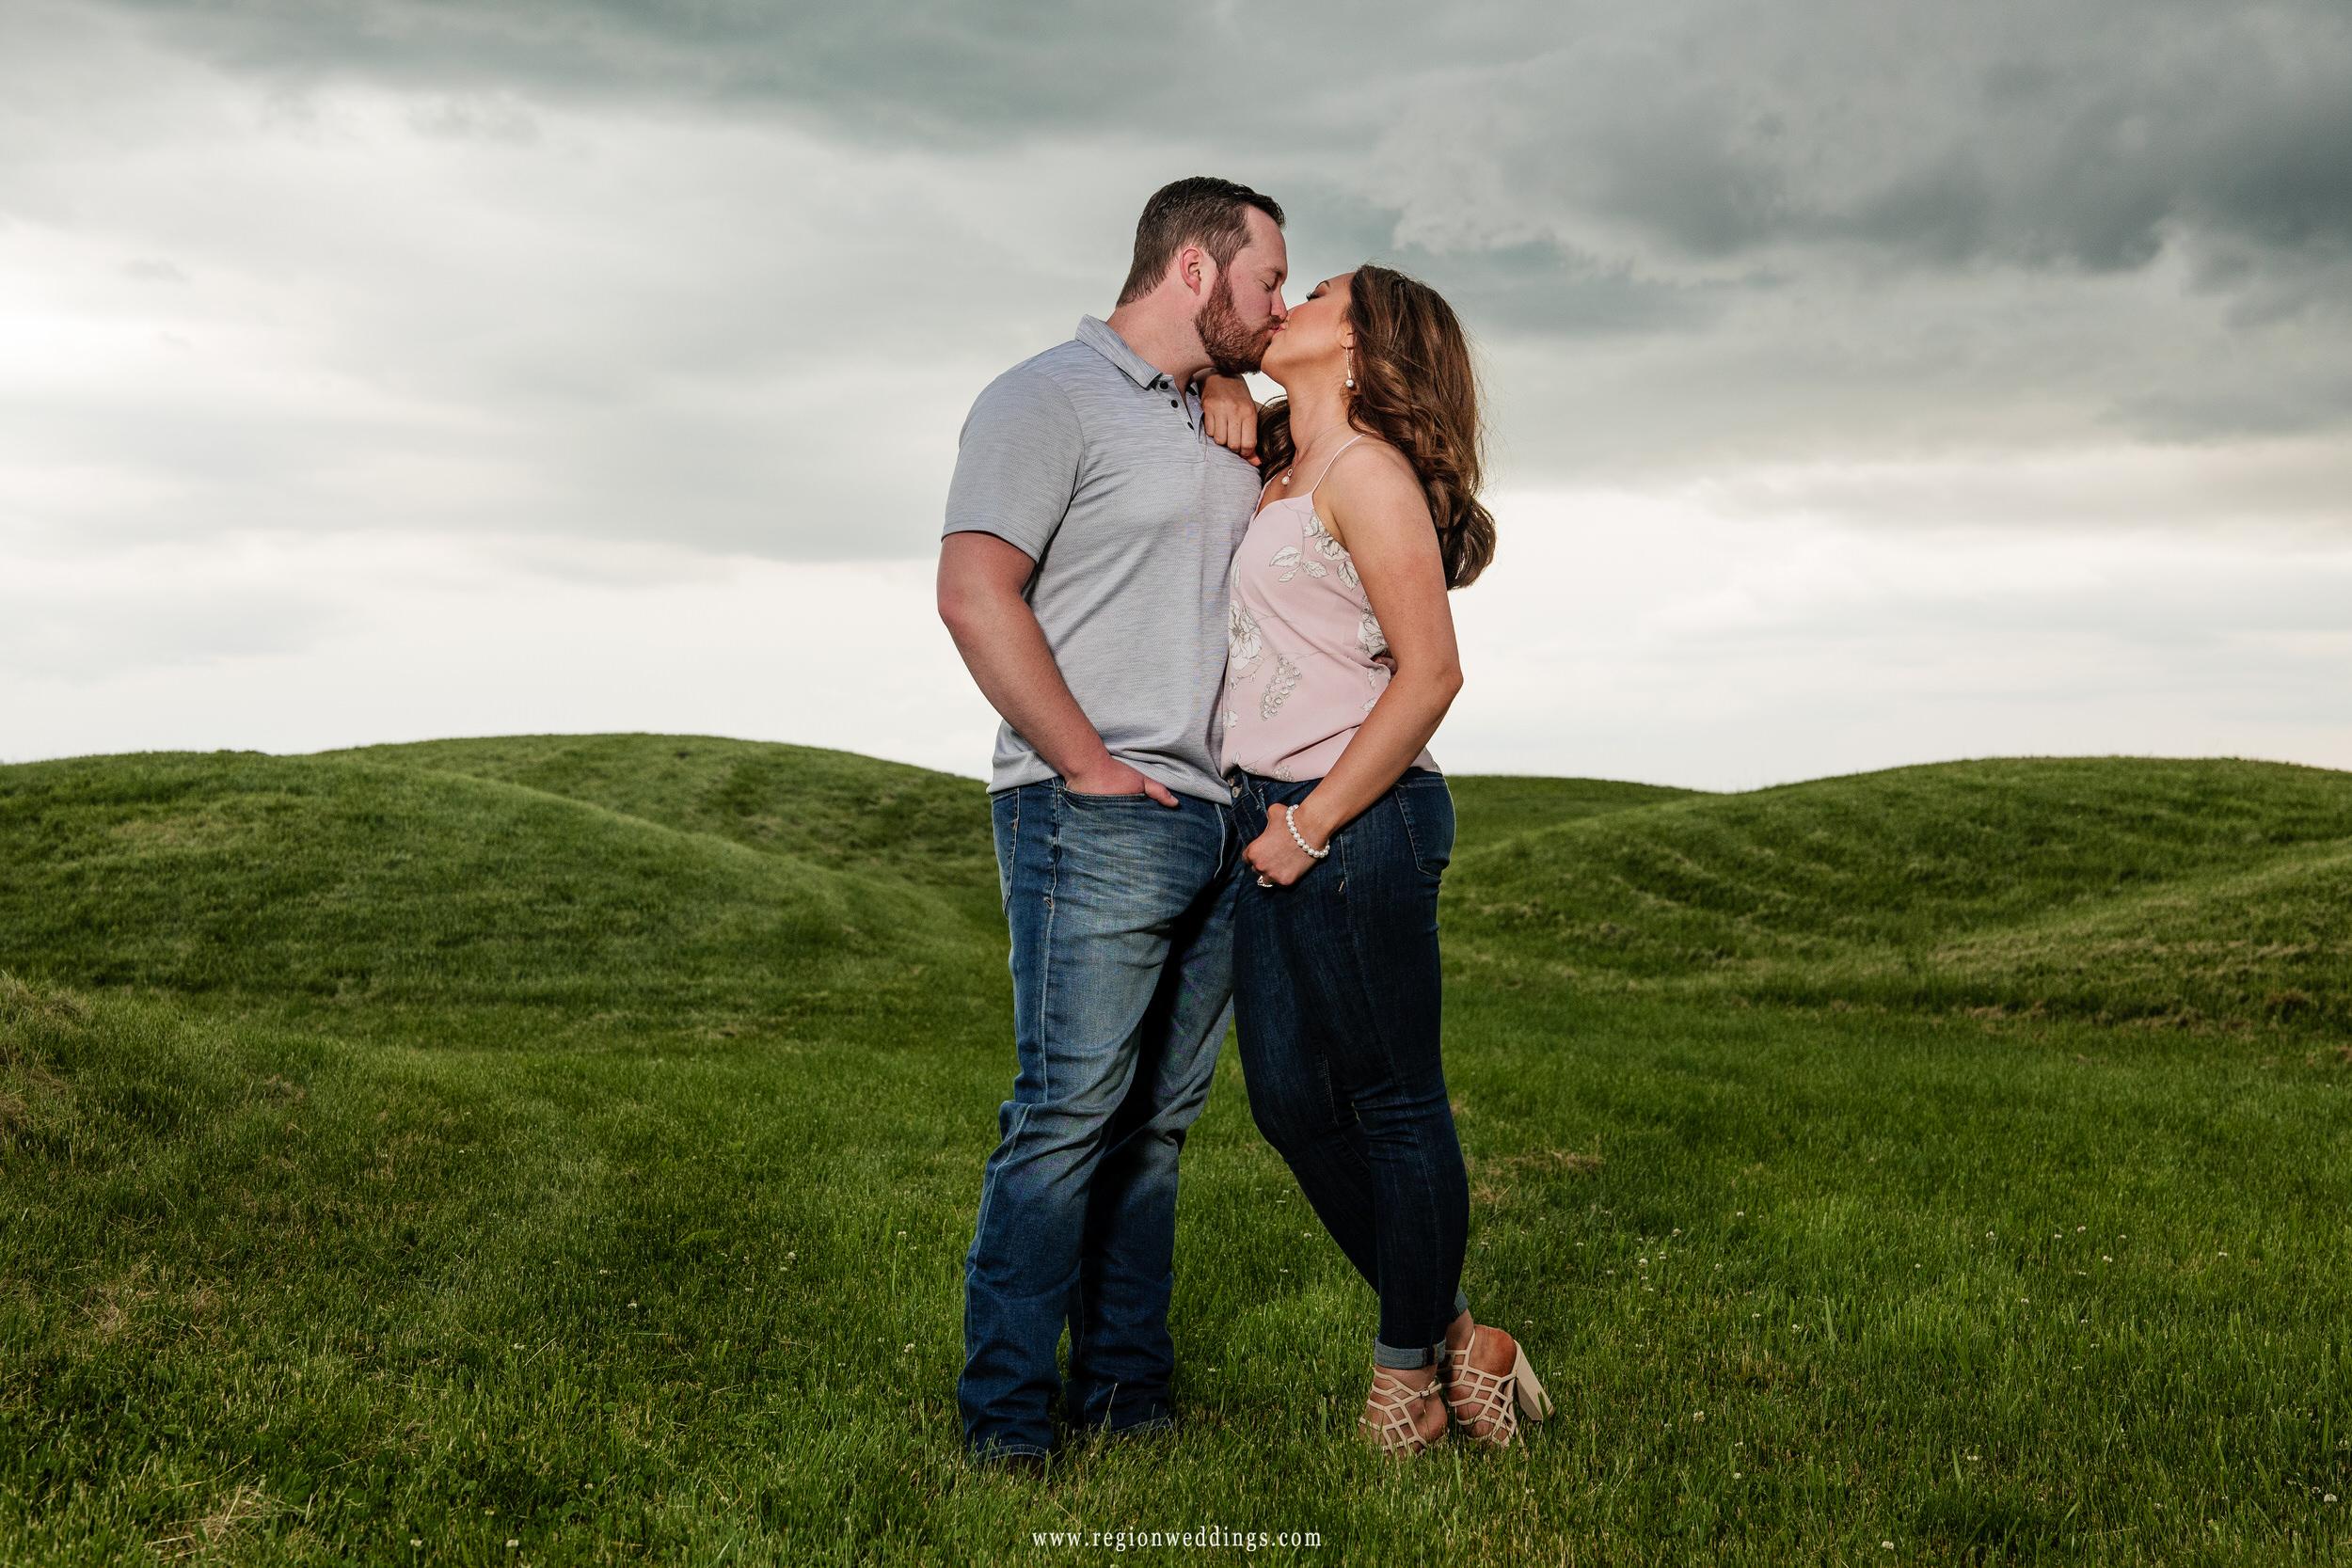 Romantic kiss amid the rolling hills of Gabis Arboretum.